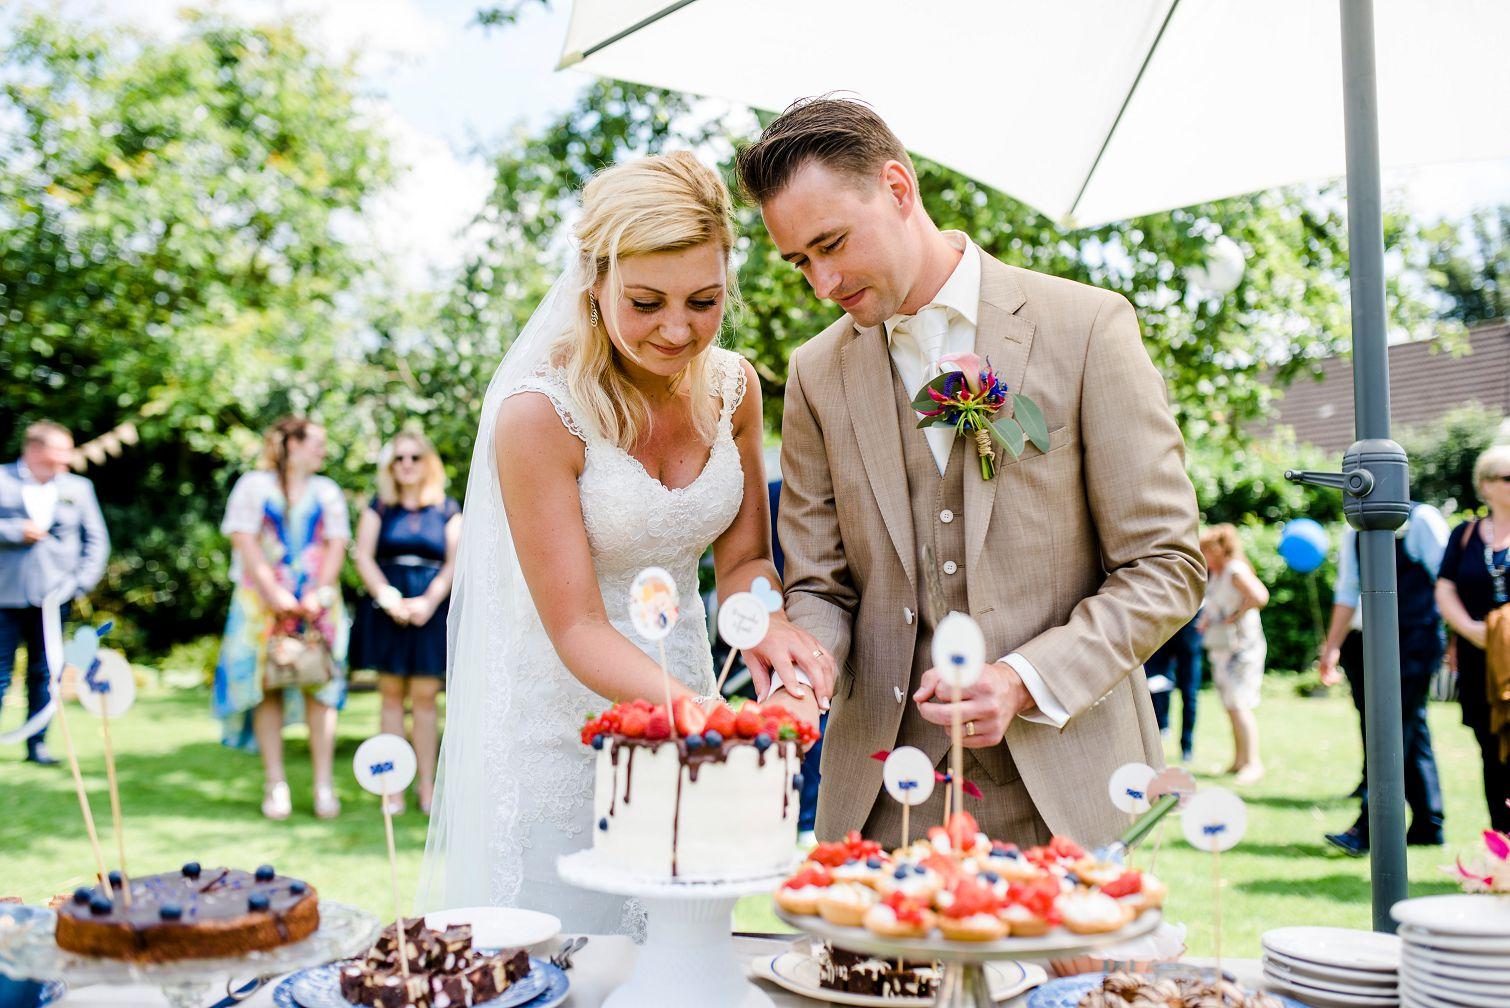 bruiloft-gasselte-de-kruimel-strand-standhuwelijk-bruidsboeket-veldboeket-aankleding-bloemist-taart-nakedcake